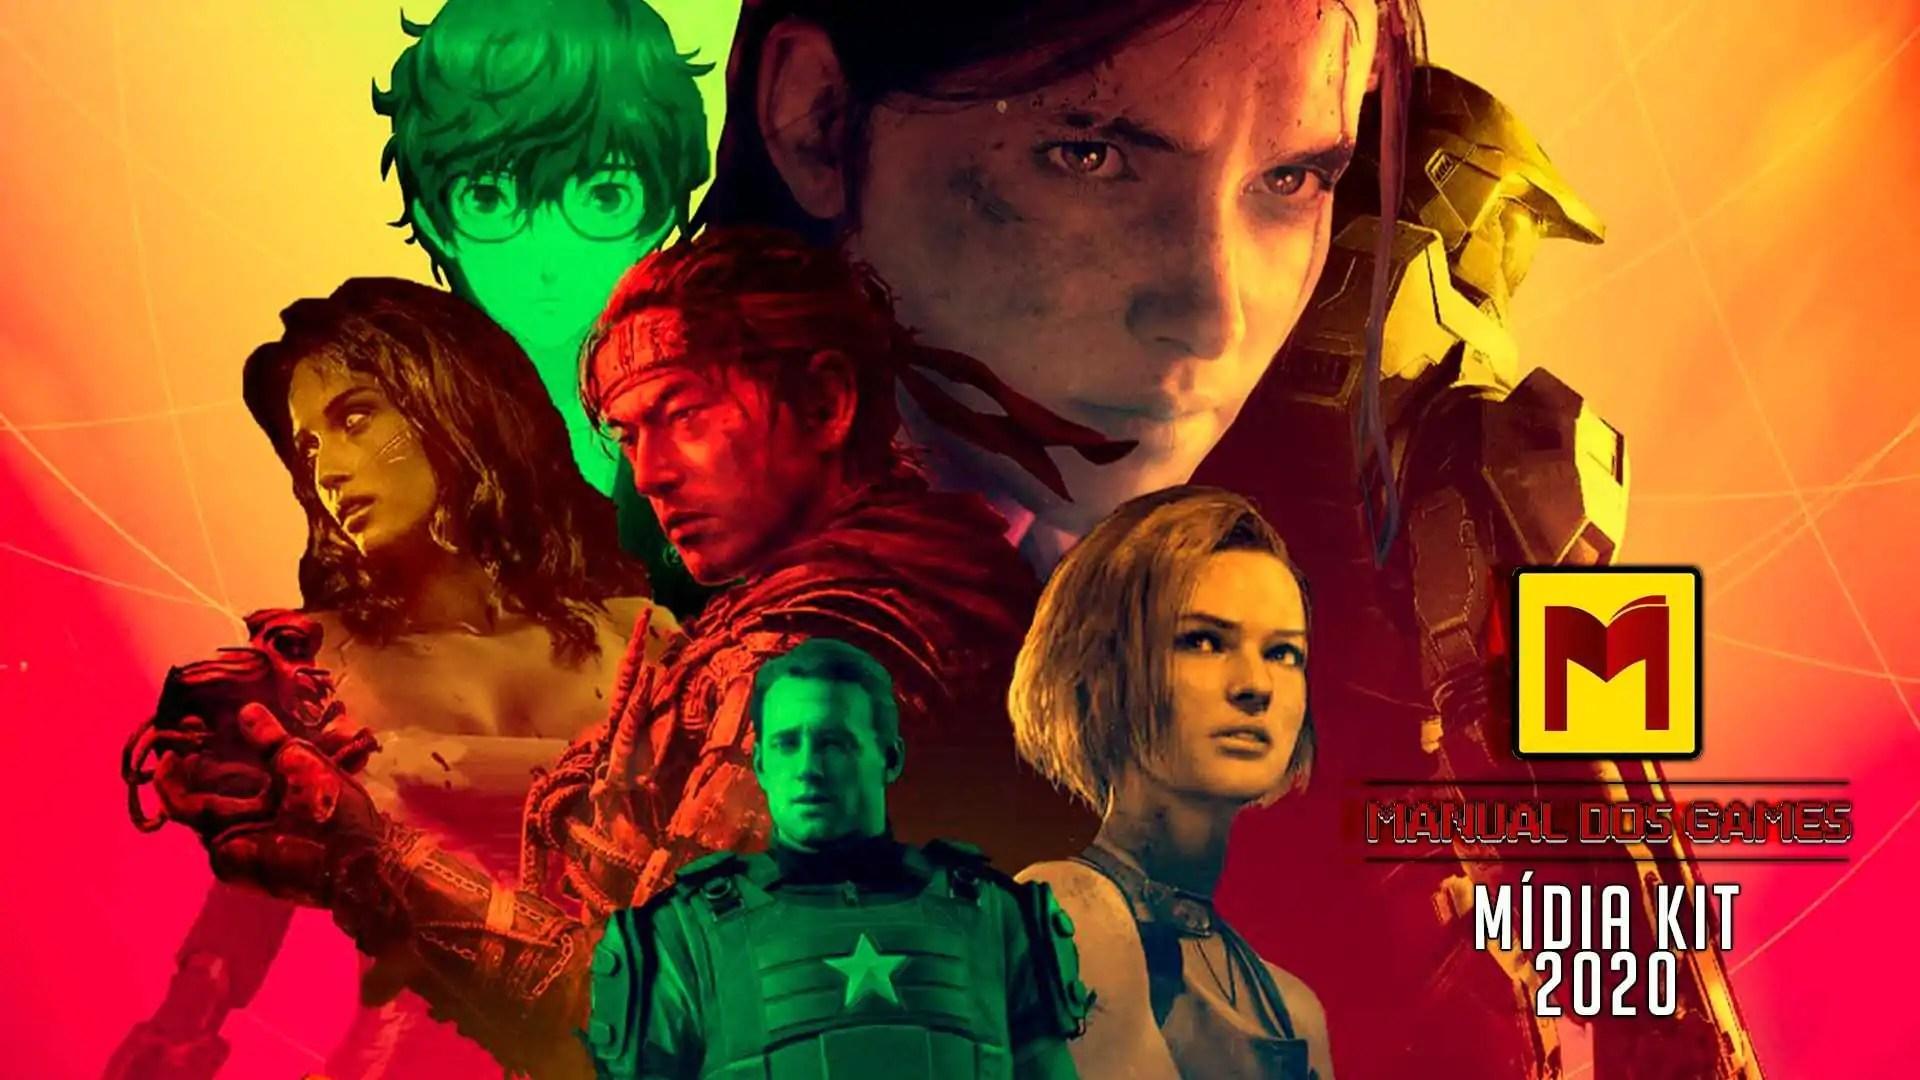 Midia Kit Manual dos Games 2020